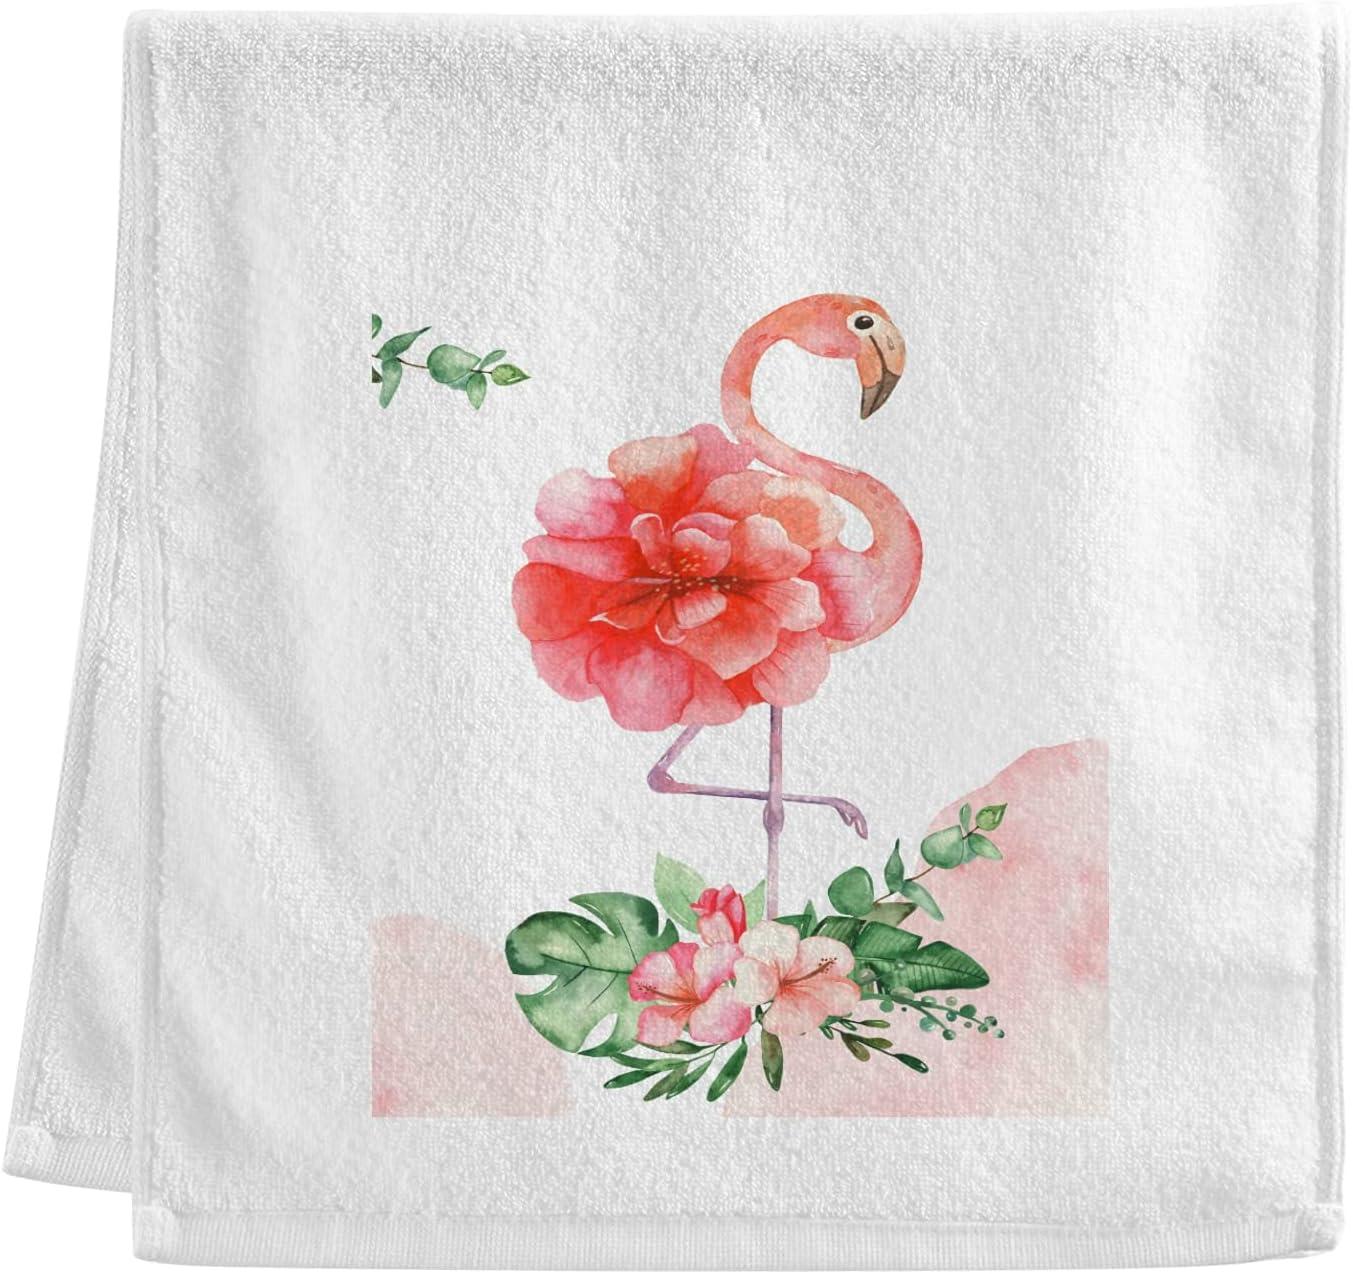 Luxury Superior 100% Cotton Bath Towels Pink Flamingo Very popular Ba Leaf FeatherPalm